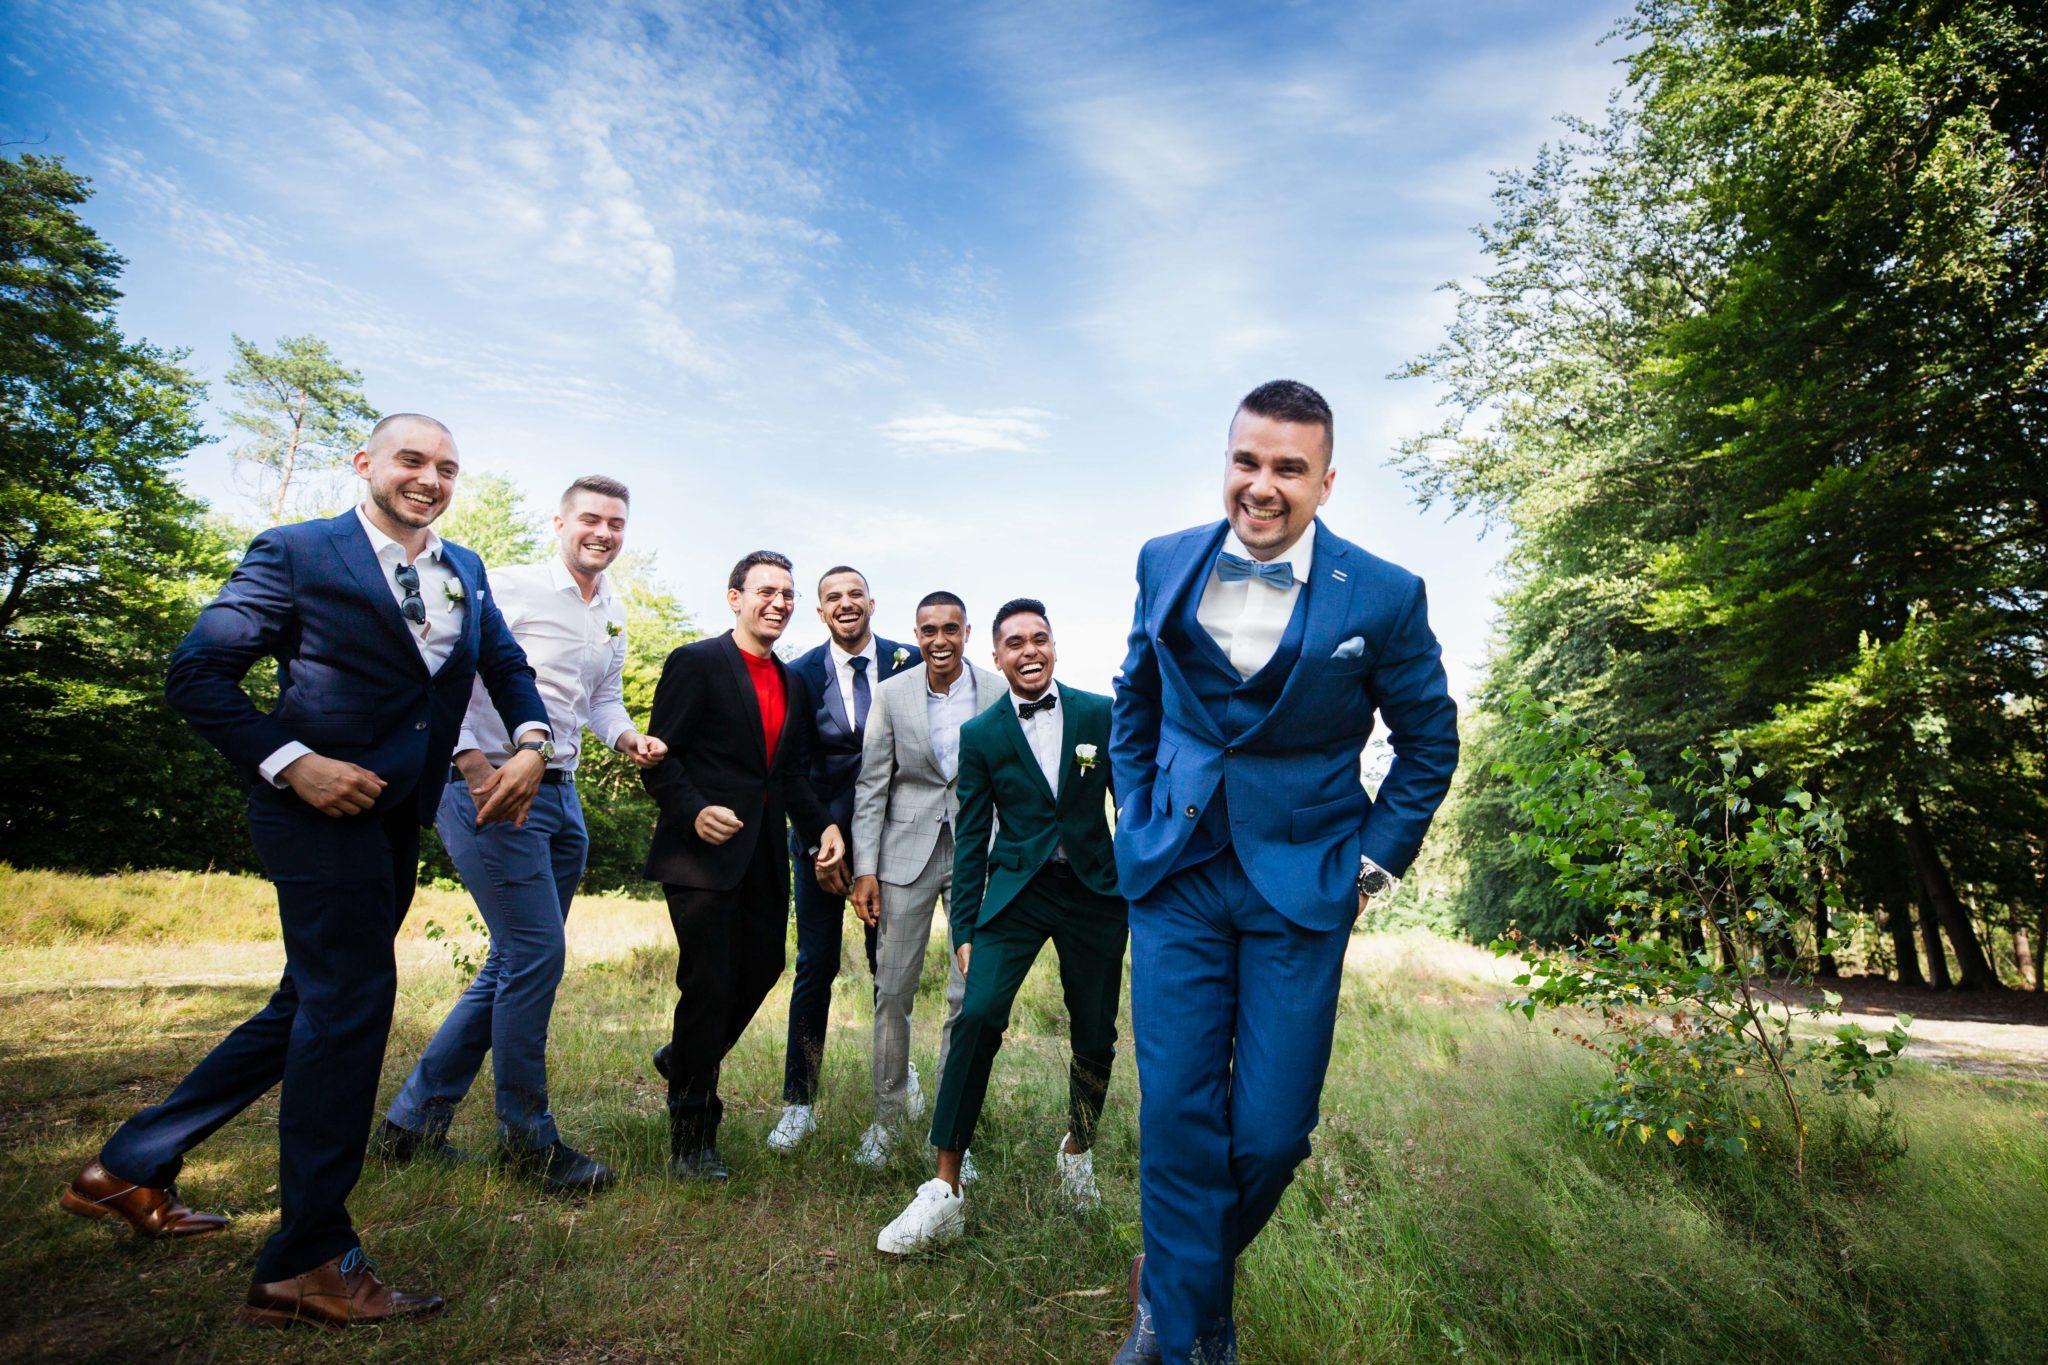 Bruidegom en vrienden bruiloft